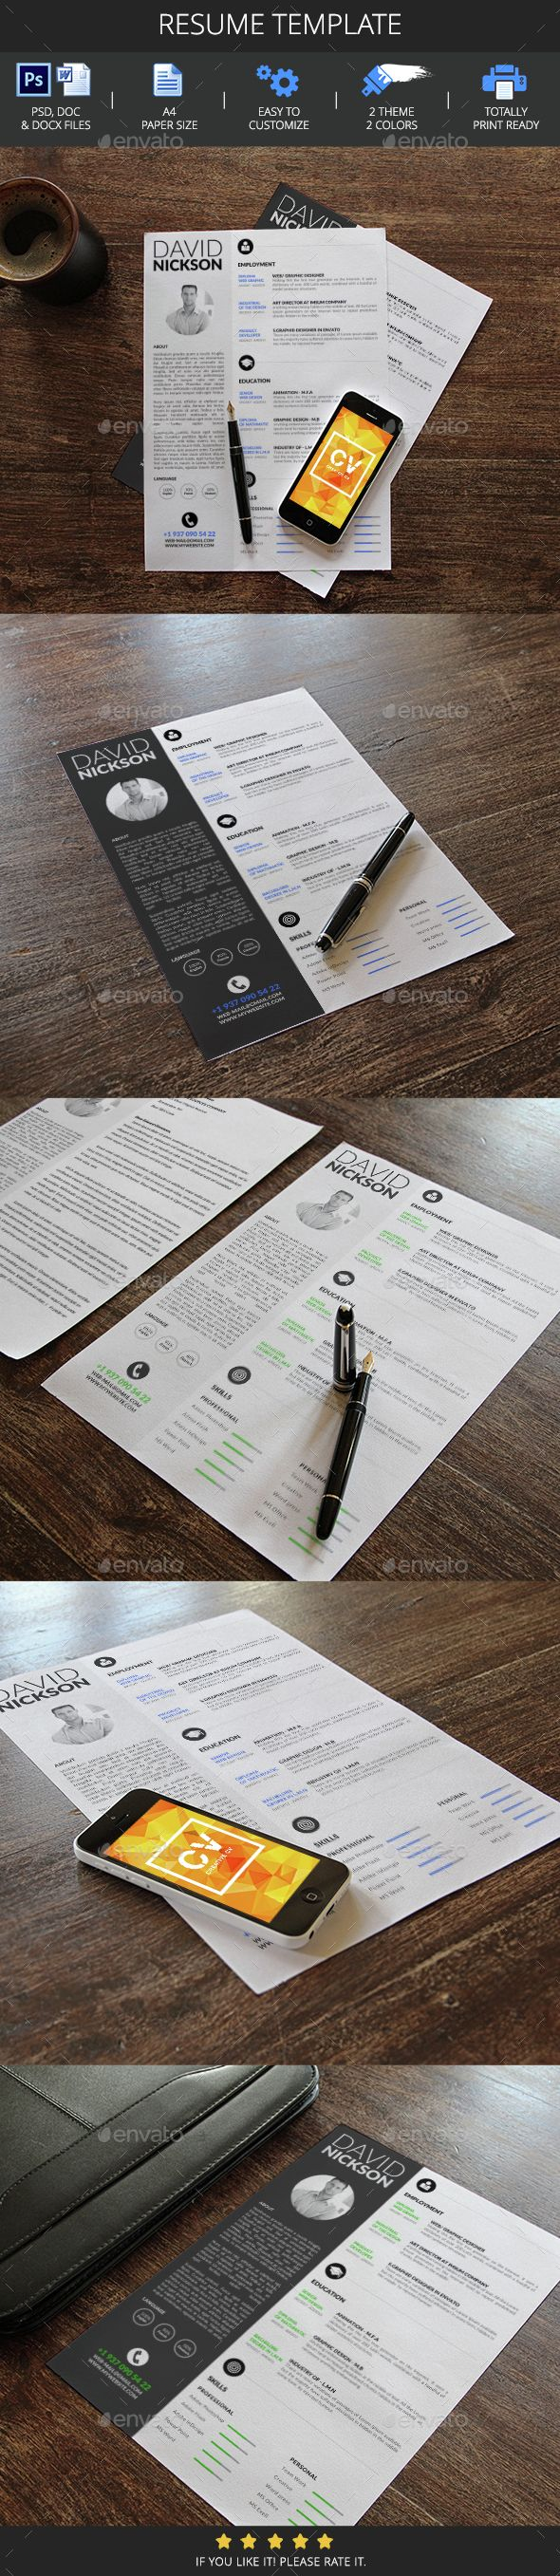 Resume Template - Resumes Stationery | Resume Templates | Pinterest ...